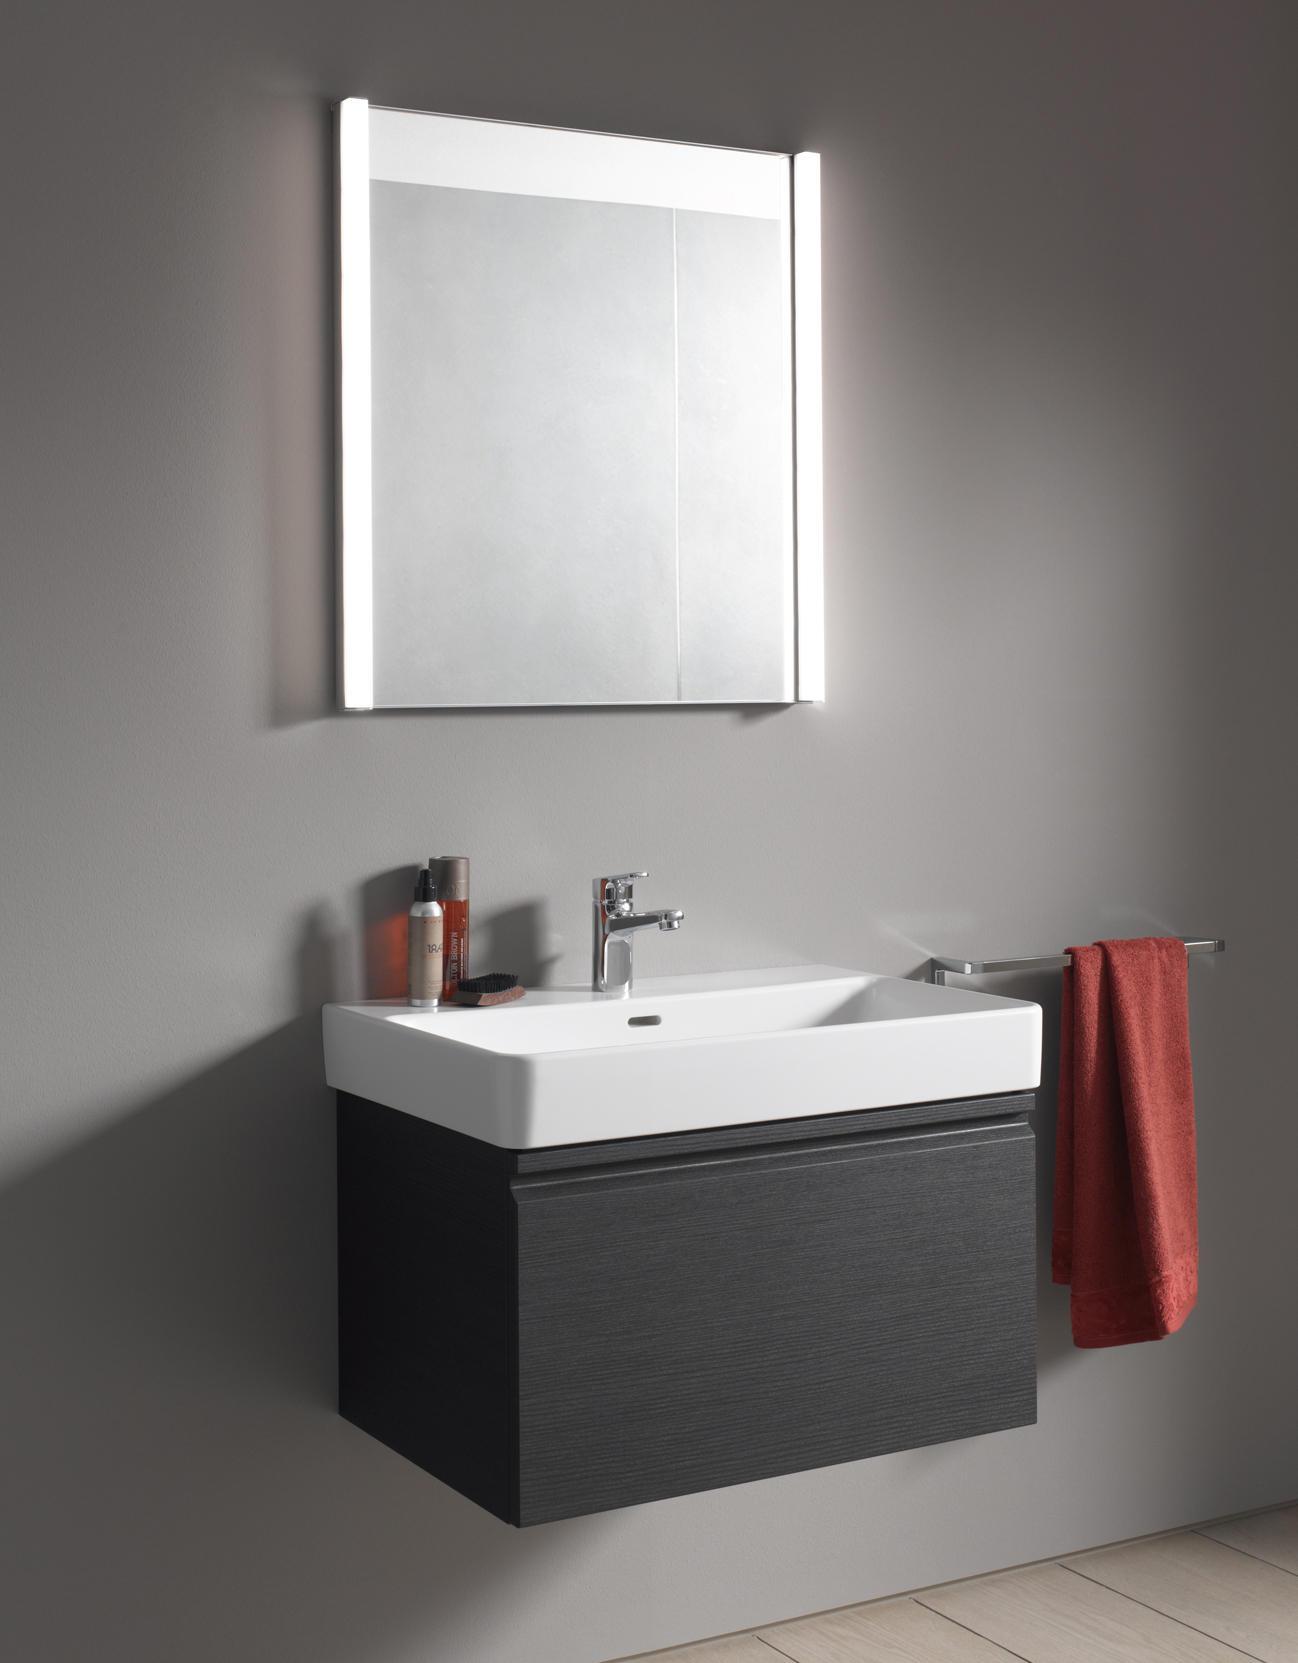 Laufen Pro Bathrooms 25 Discount